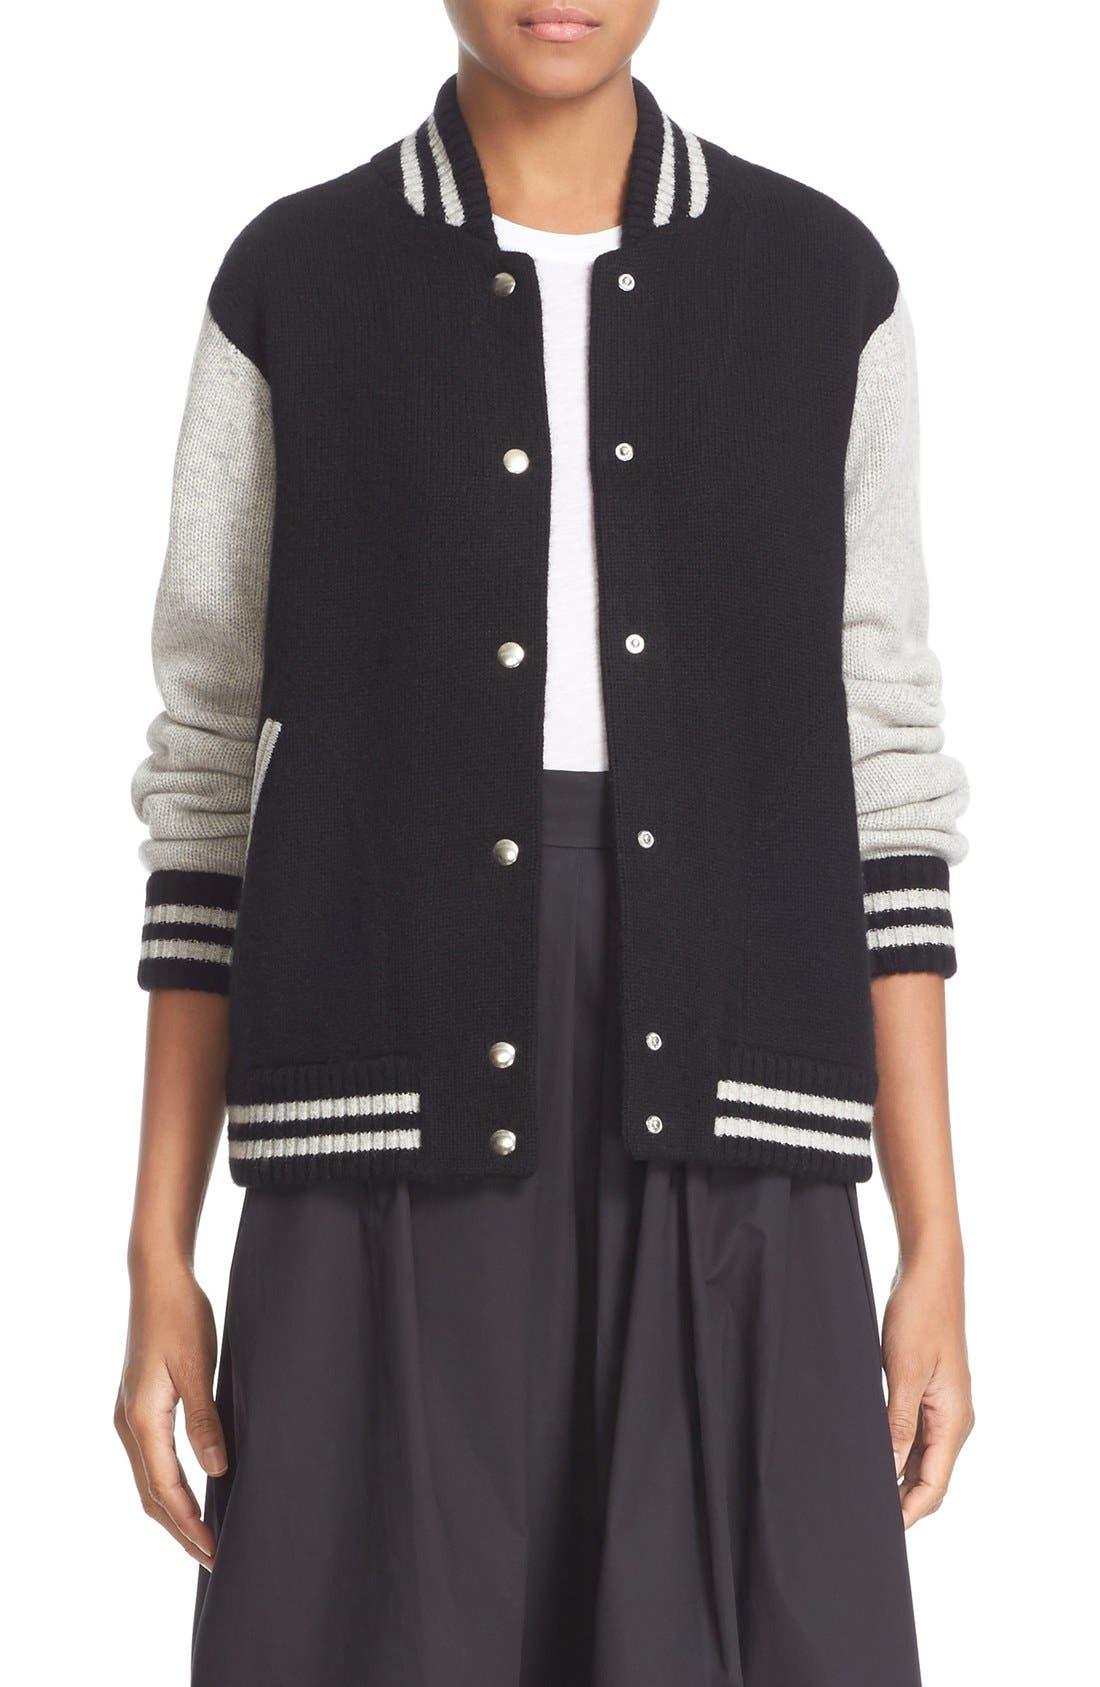 Stripe Detail Wool & Cashmere Knit Varsity Jacket,                             Main thumbnail 1, color,                             Black